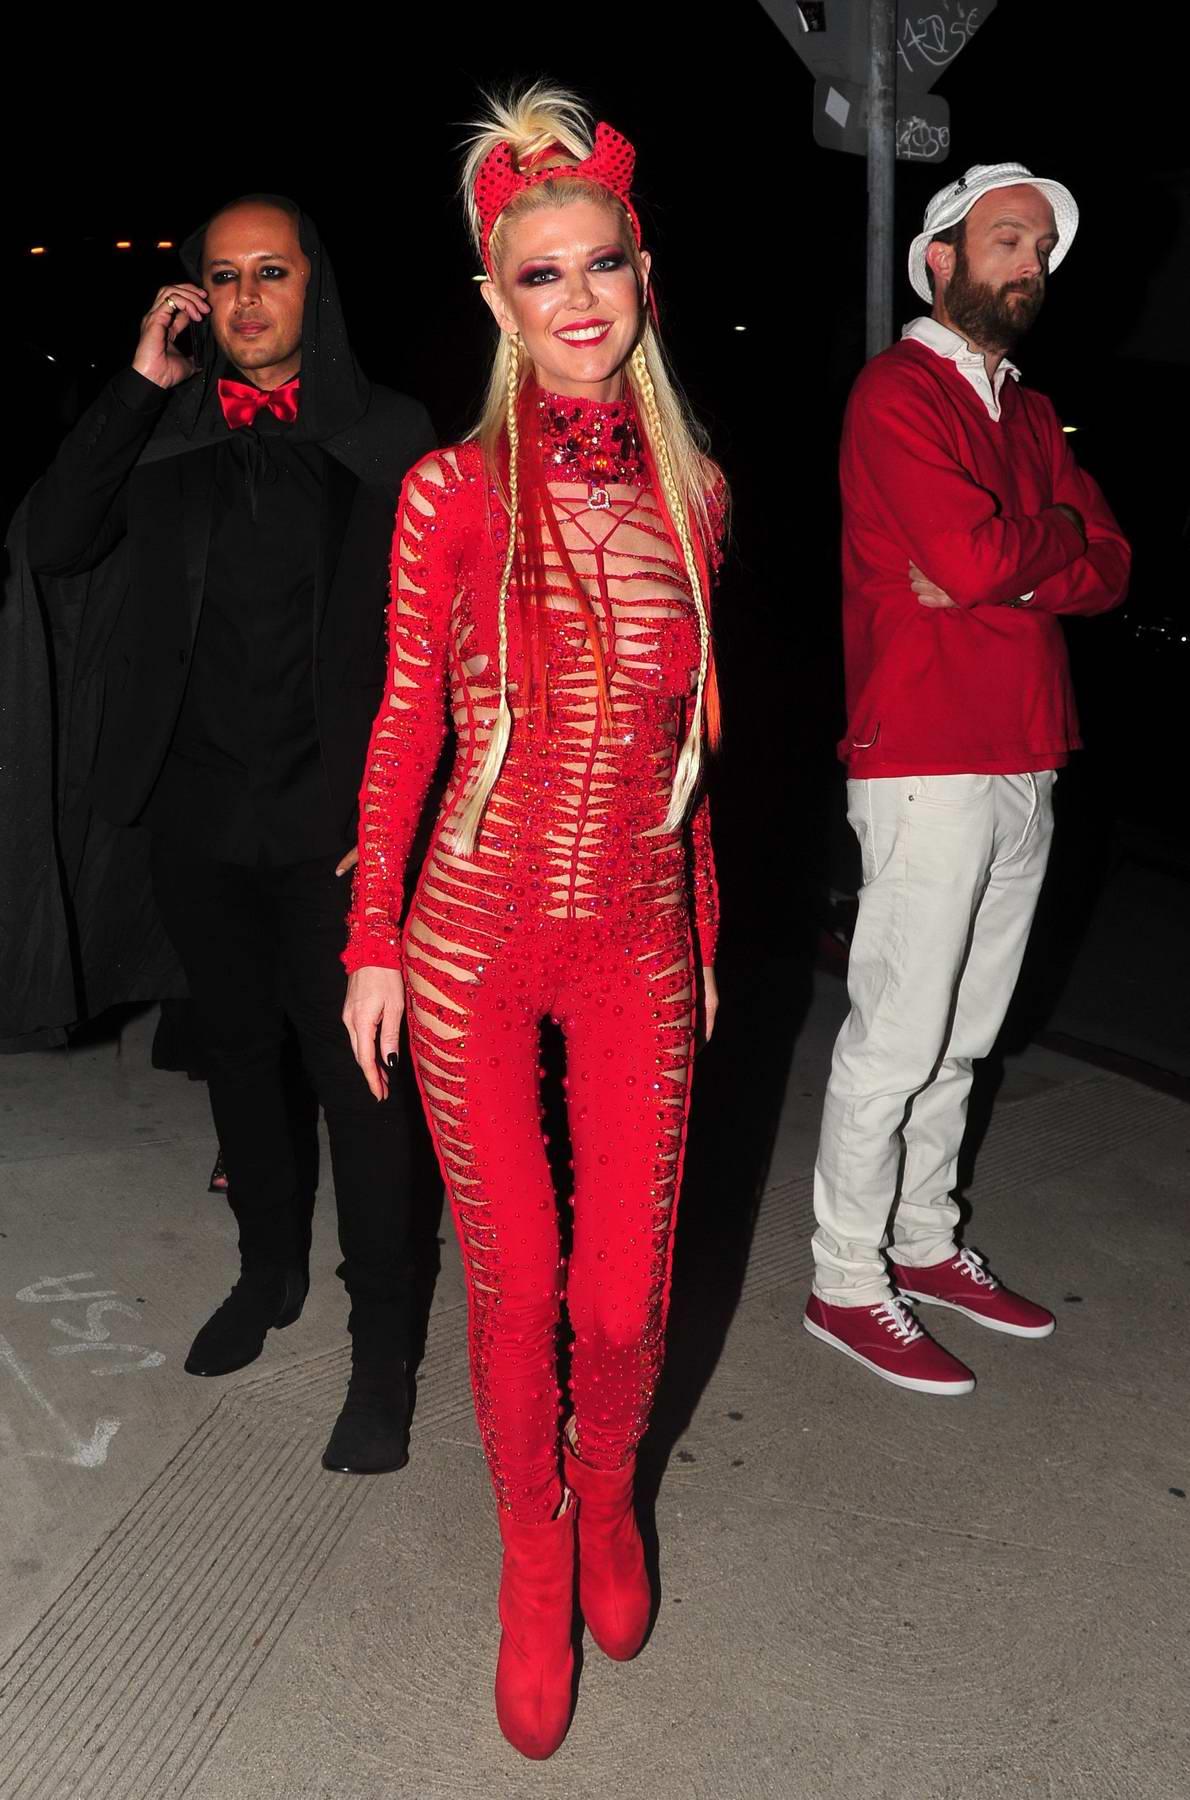 Tara Reid at the 2017 Maxim Halloween party in Los Angeles